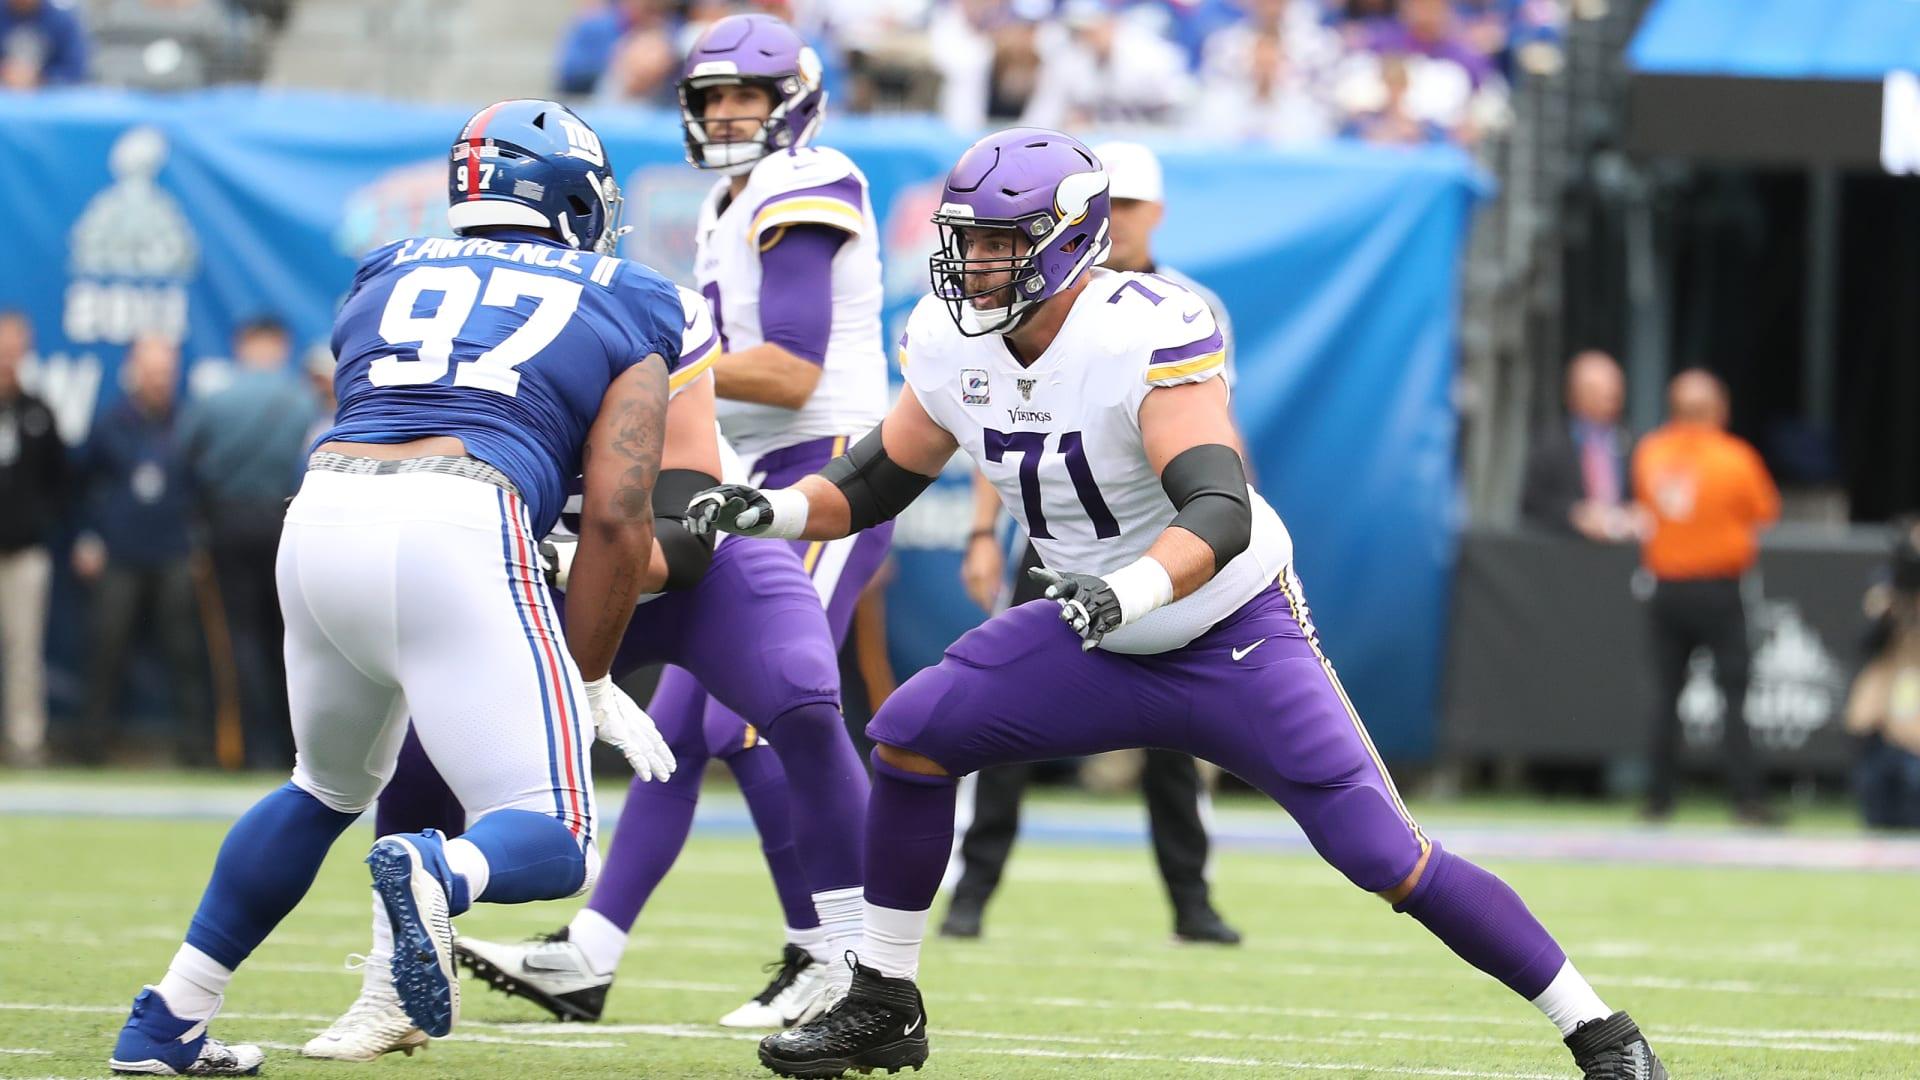 Cleveland Browns, Vikings should discuss deal for veteran starter